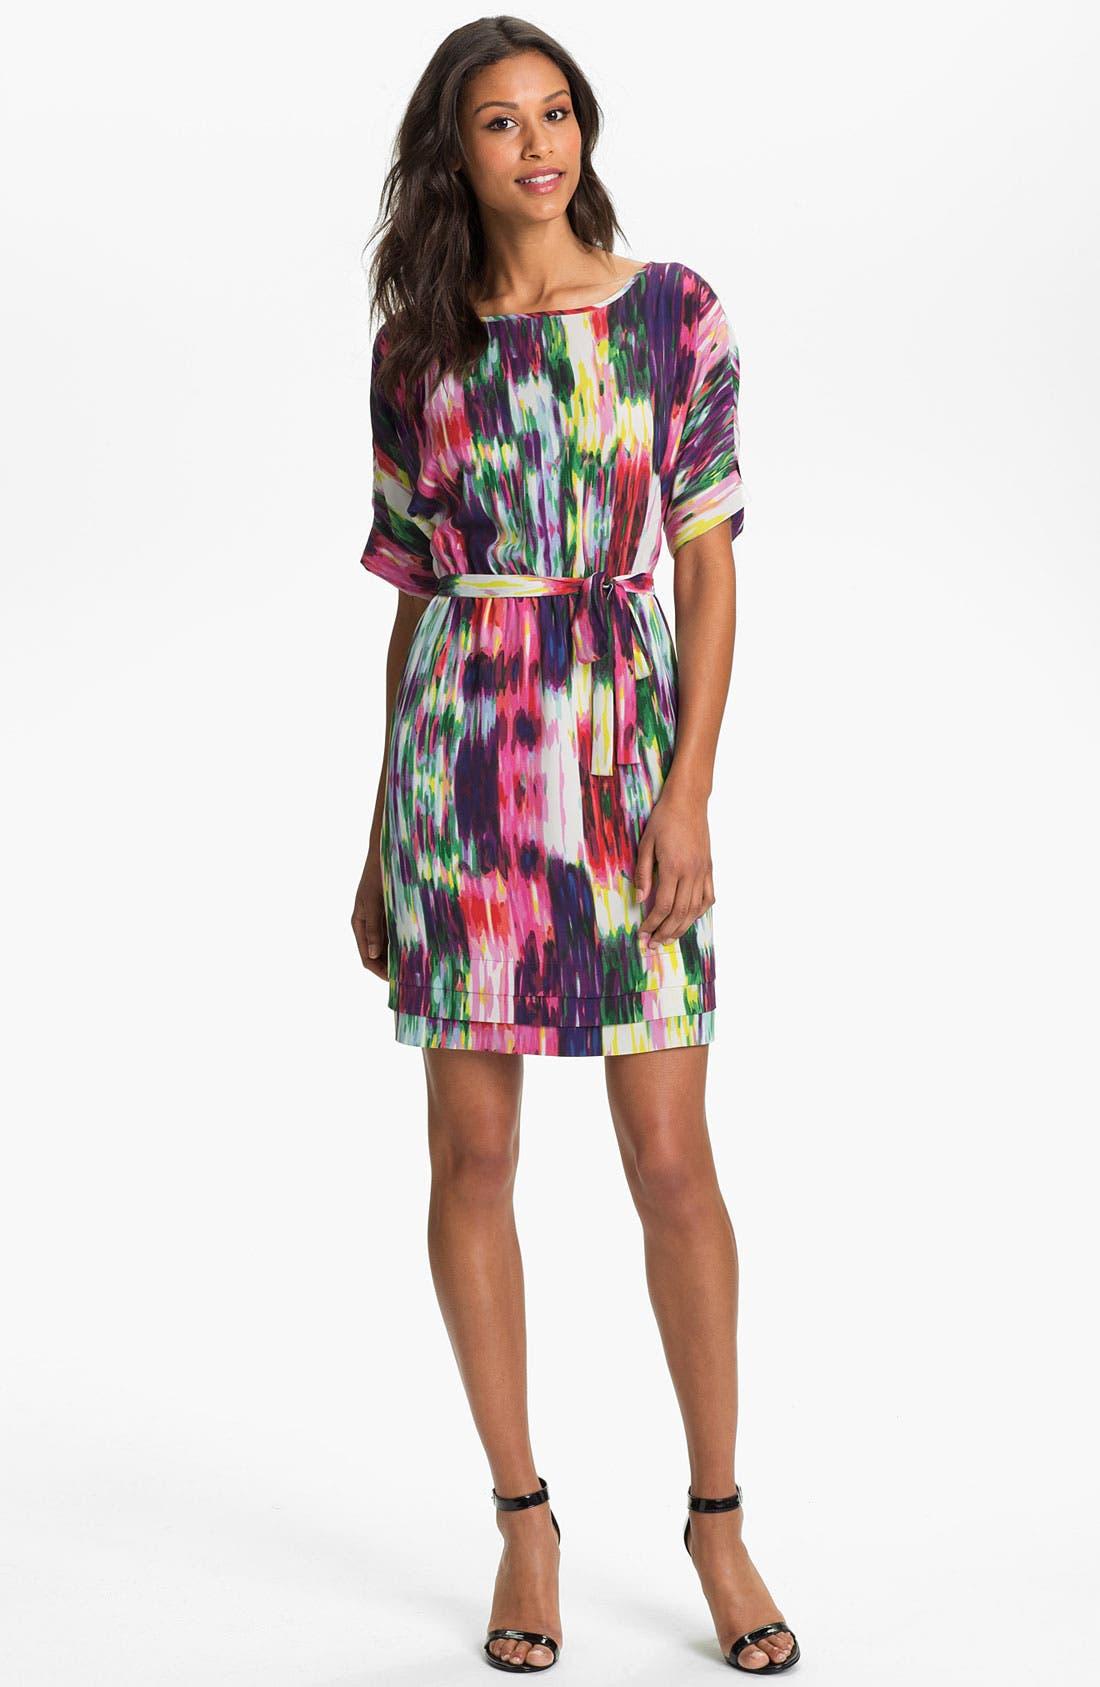 Main Image - Presley Skye Dolman Sleeve Print Dress